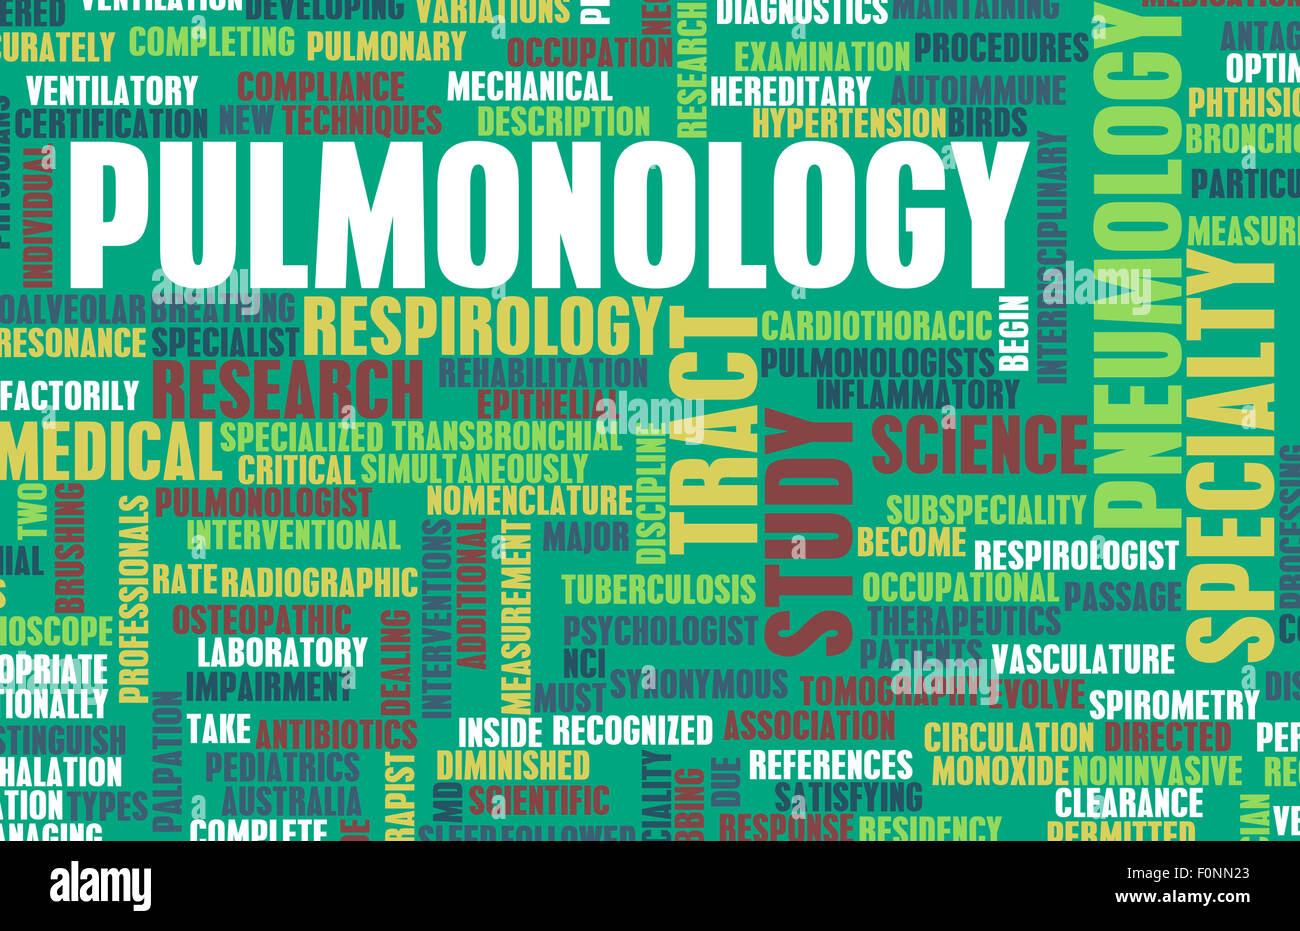 Pulmonology or Pulmonologist Medical Field Specialty As Art - Stock Image